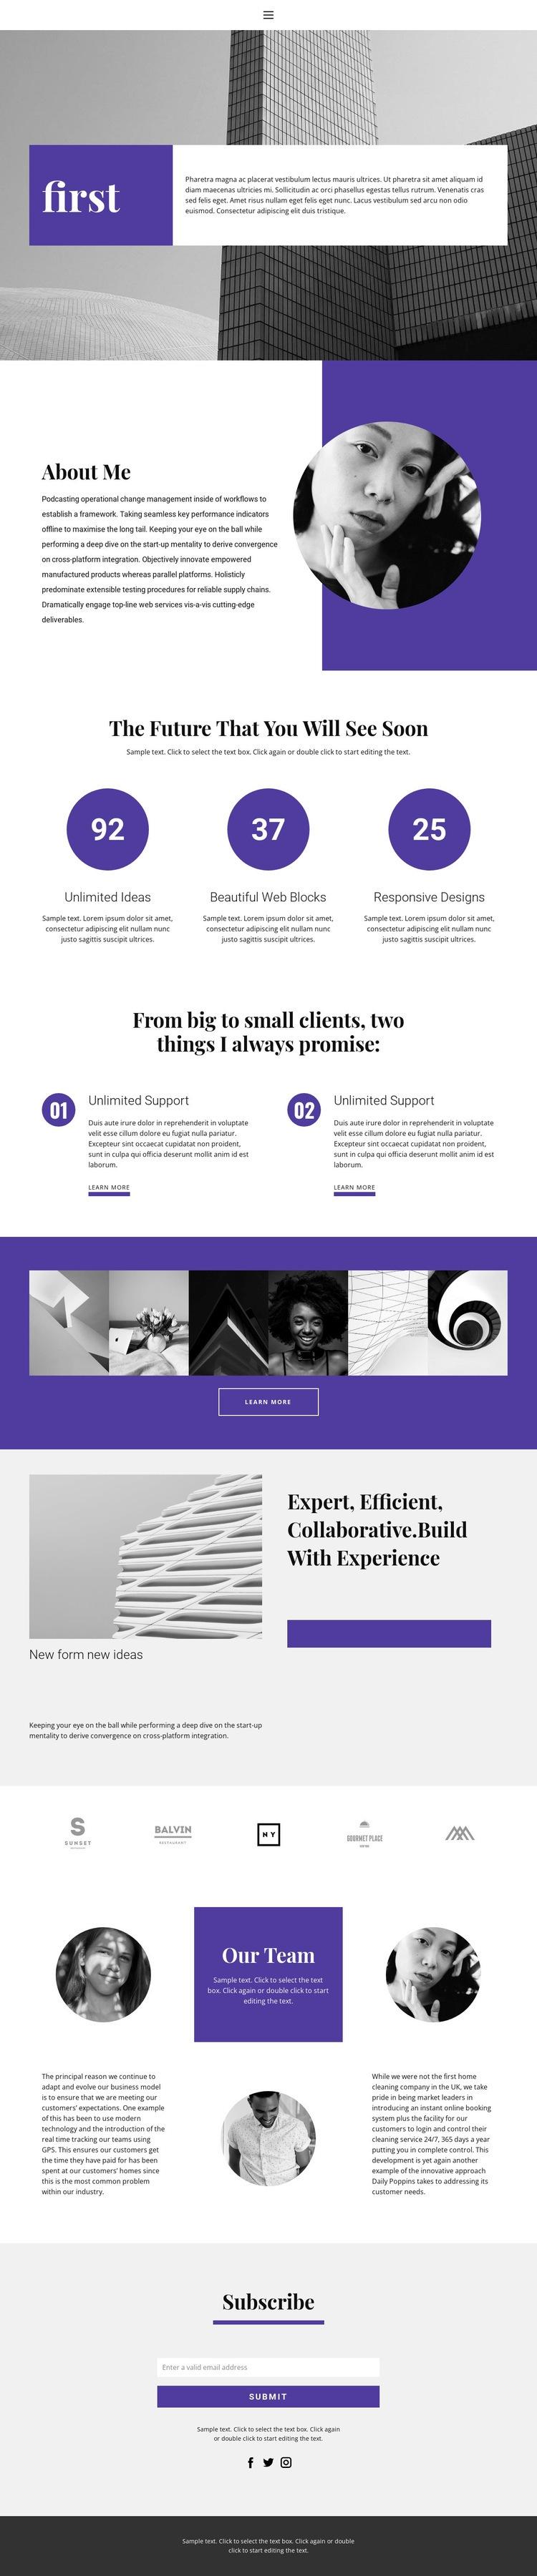 New creative studio Web Page Designer